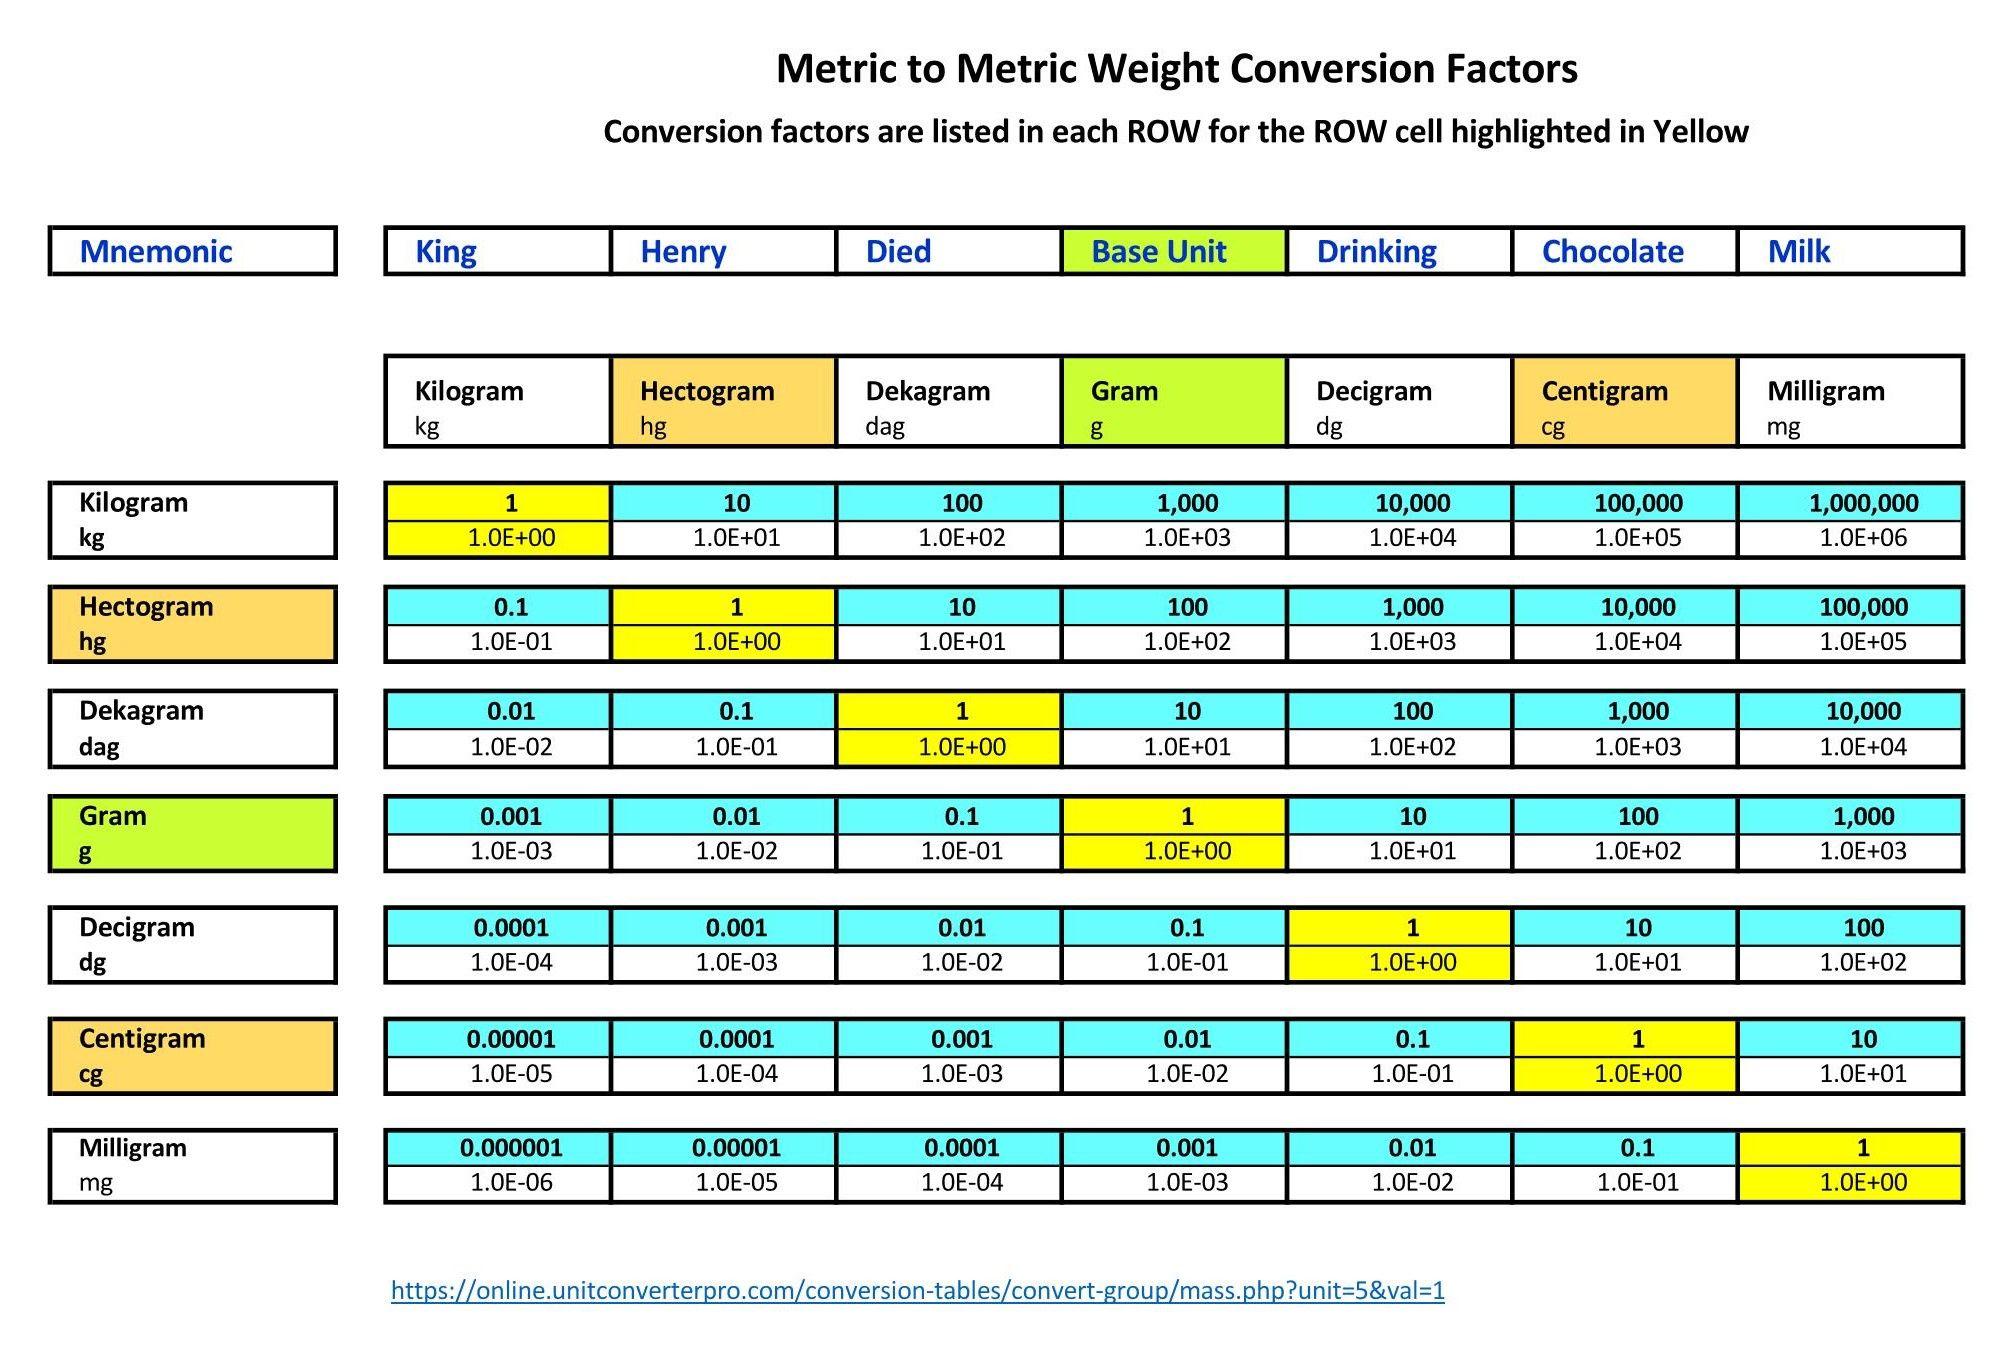 Pin On Metric To Metric Conversion Factors